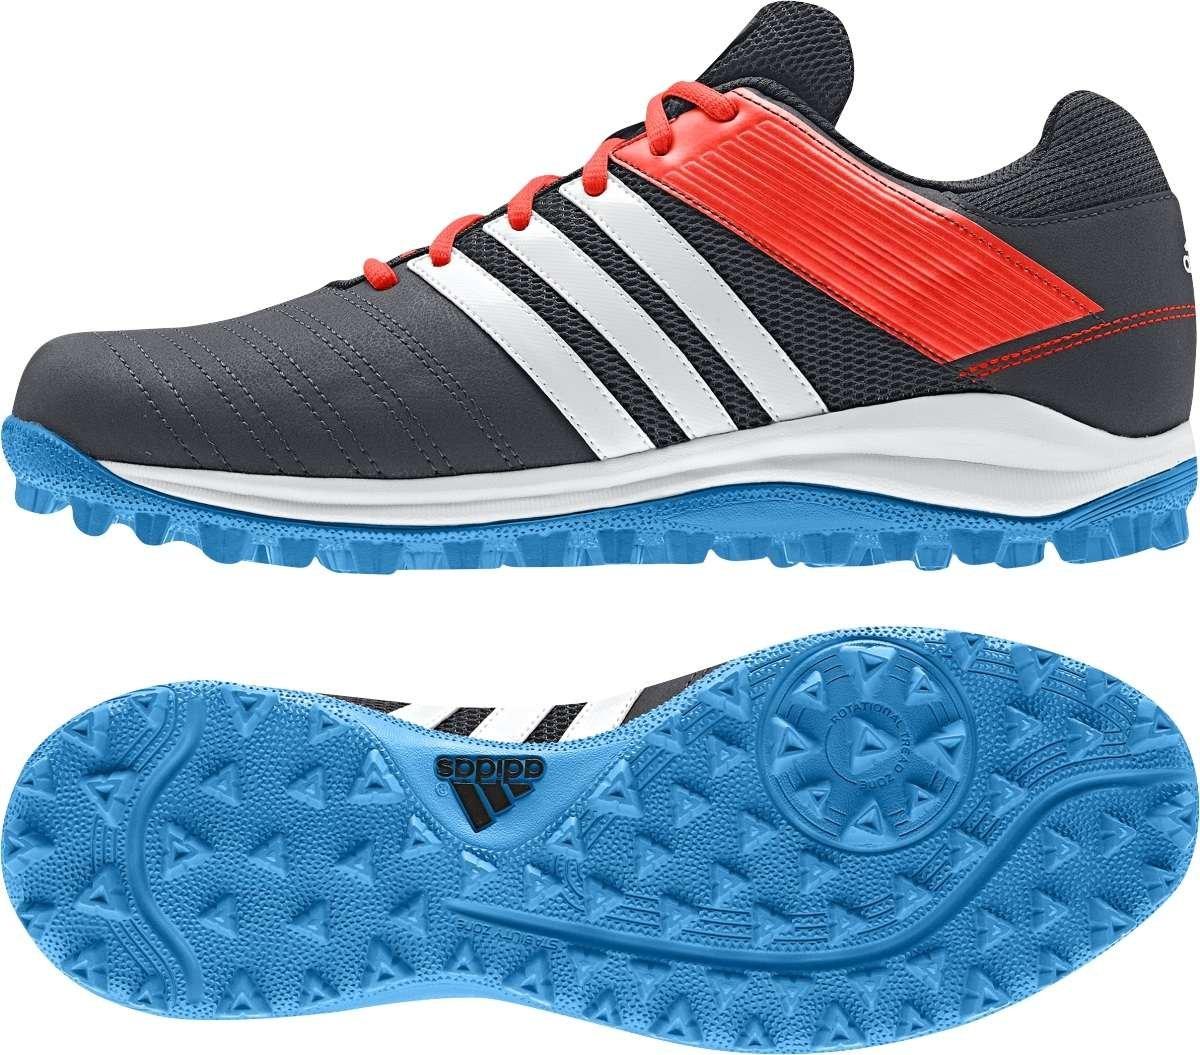 adidas Mens SRS 4 Hockey black breathable mesh upper traxion sole shoes M29763